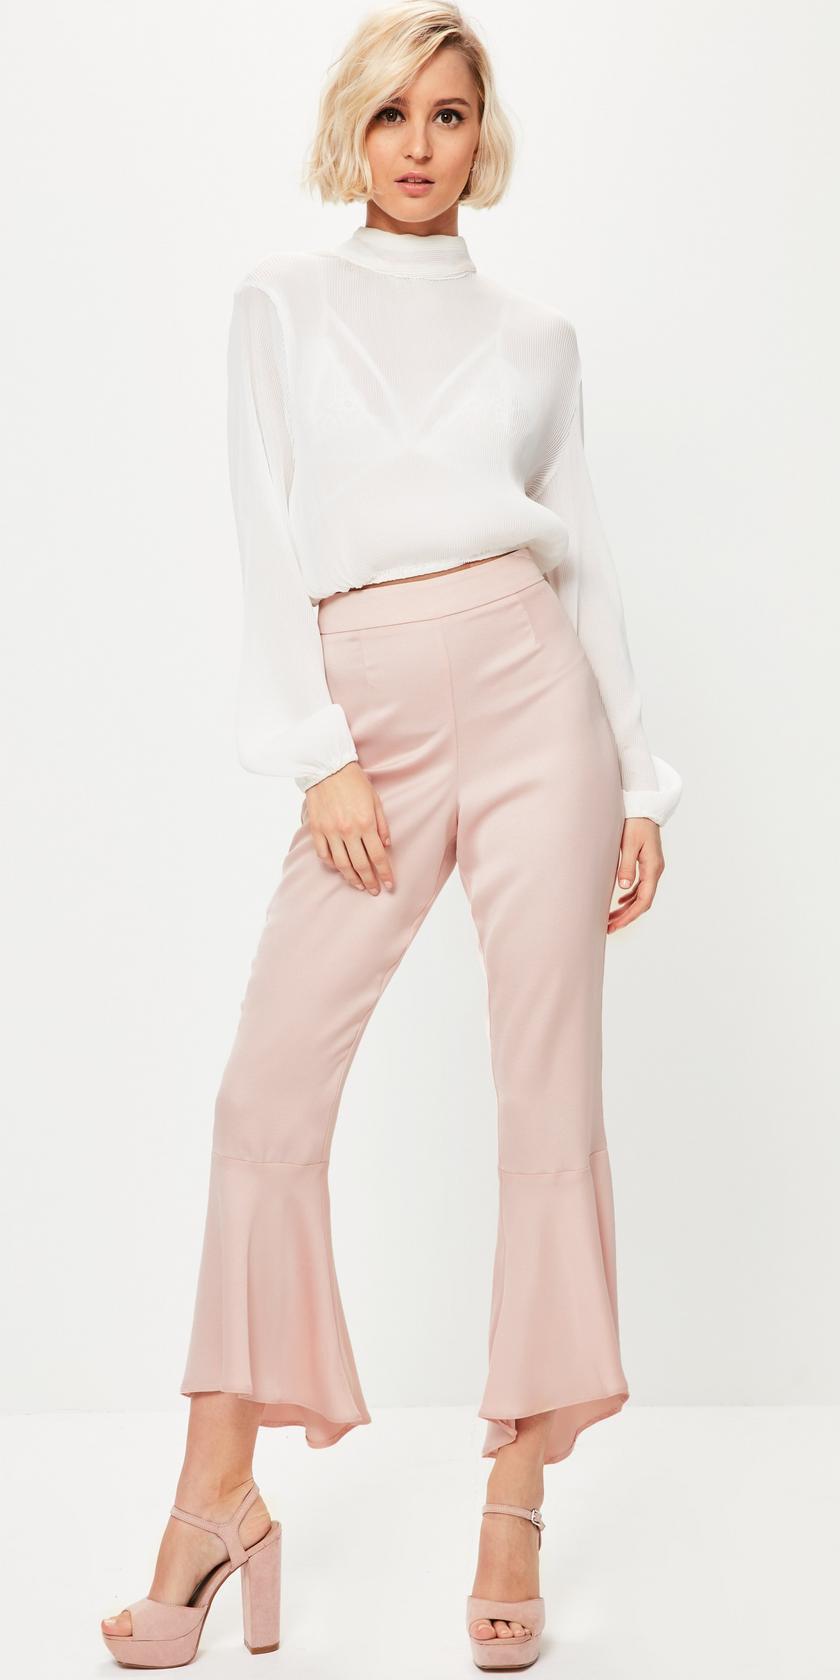 pink-light-culottes-pants-white-top-blouse-pink-shoe-sandalh-bob-spring-summer-blonde-dinner.jpg